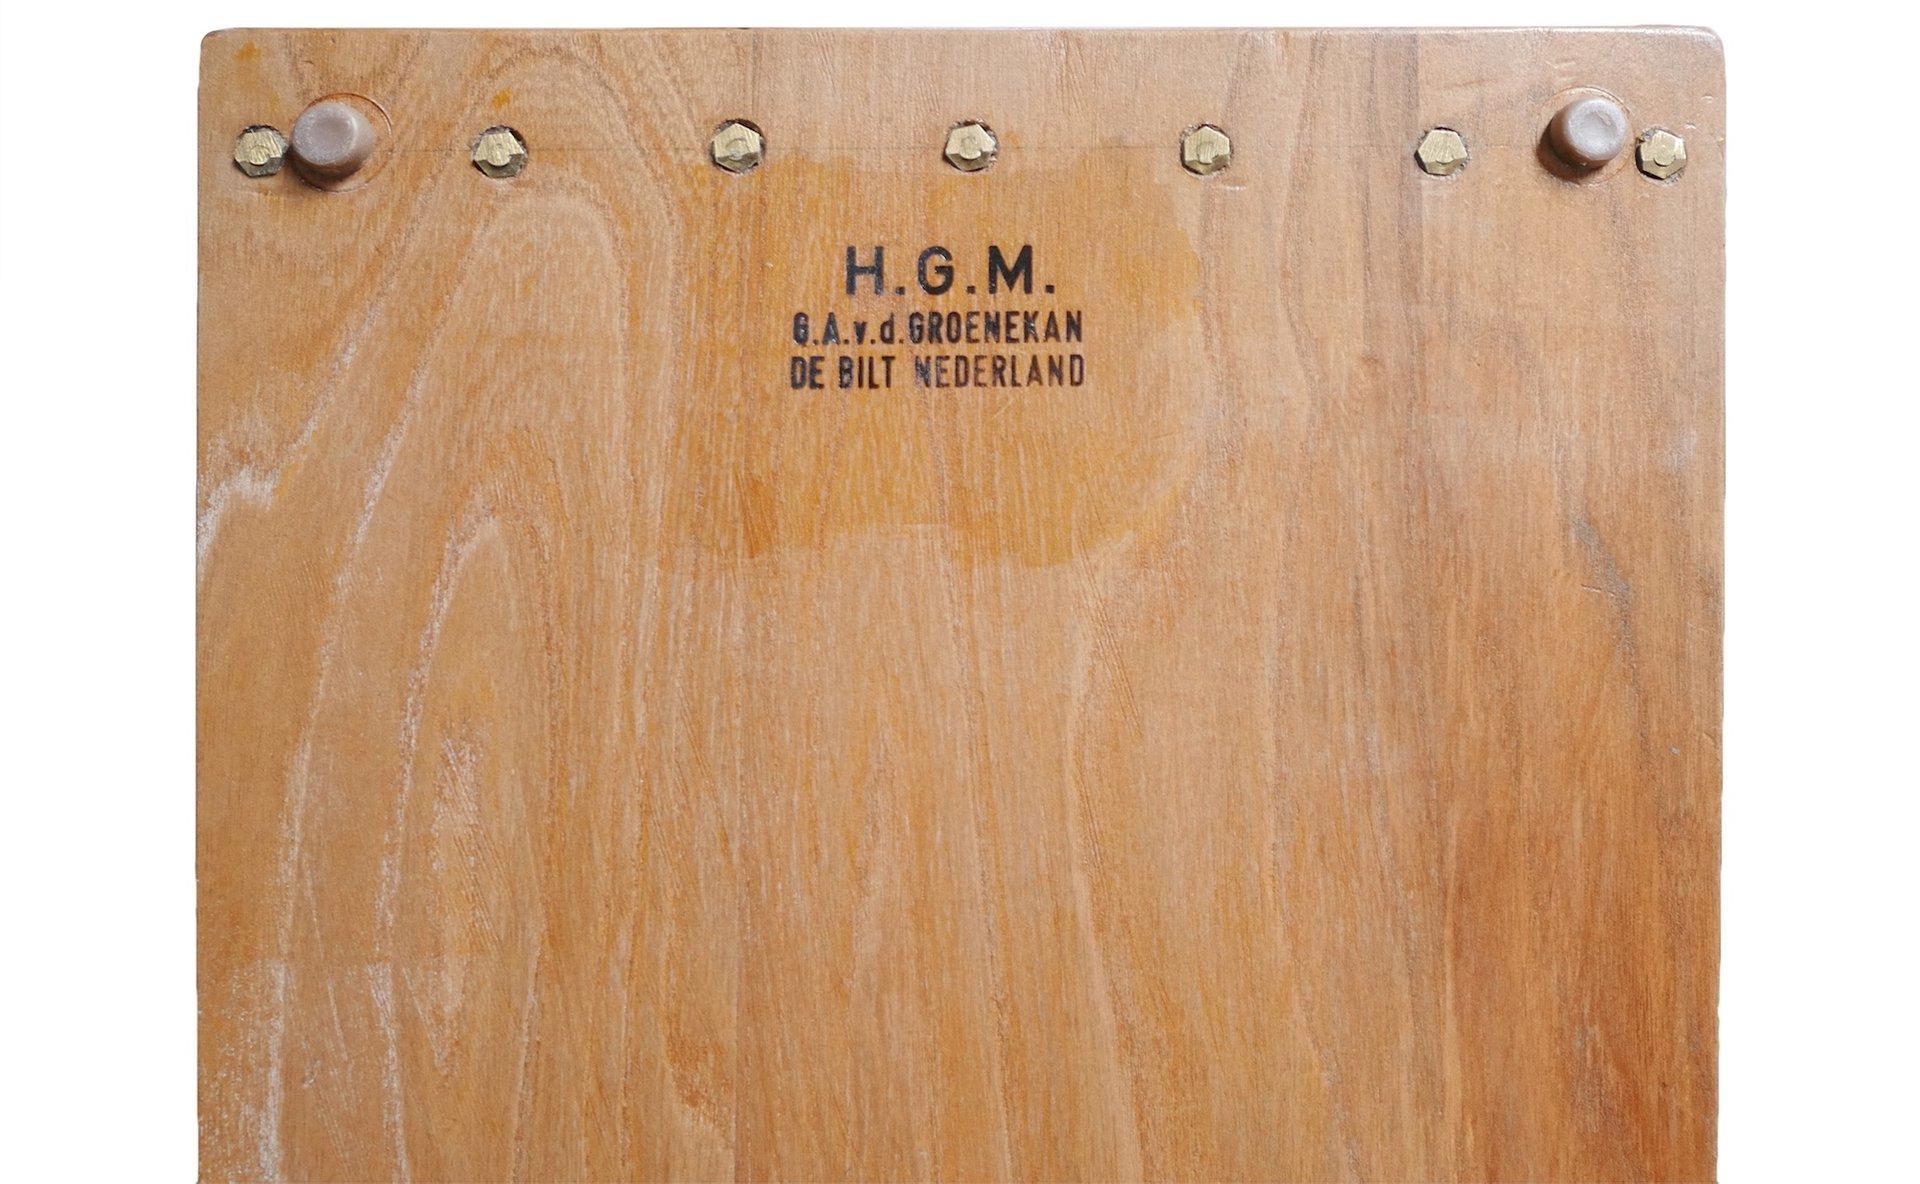 Sedia zig zag di gerrit rietveld 1969 in vendita su pamono for Sedia zig zag cassina prezzo